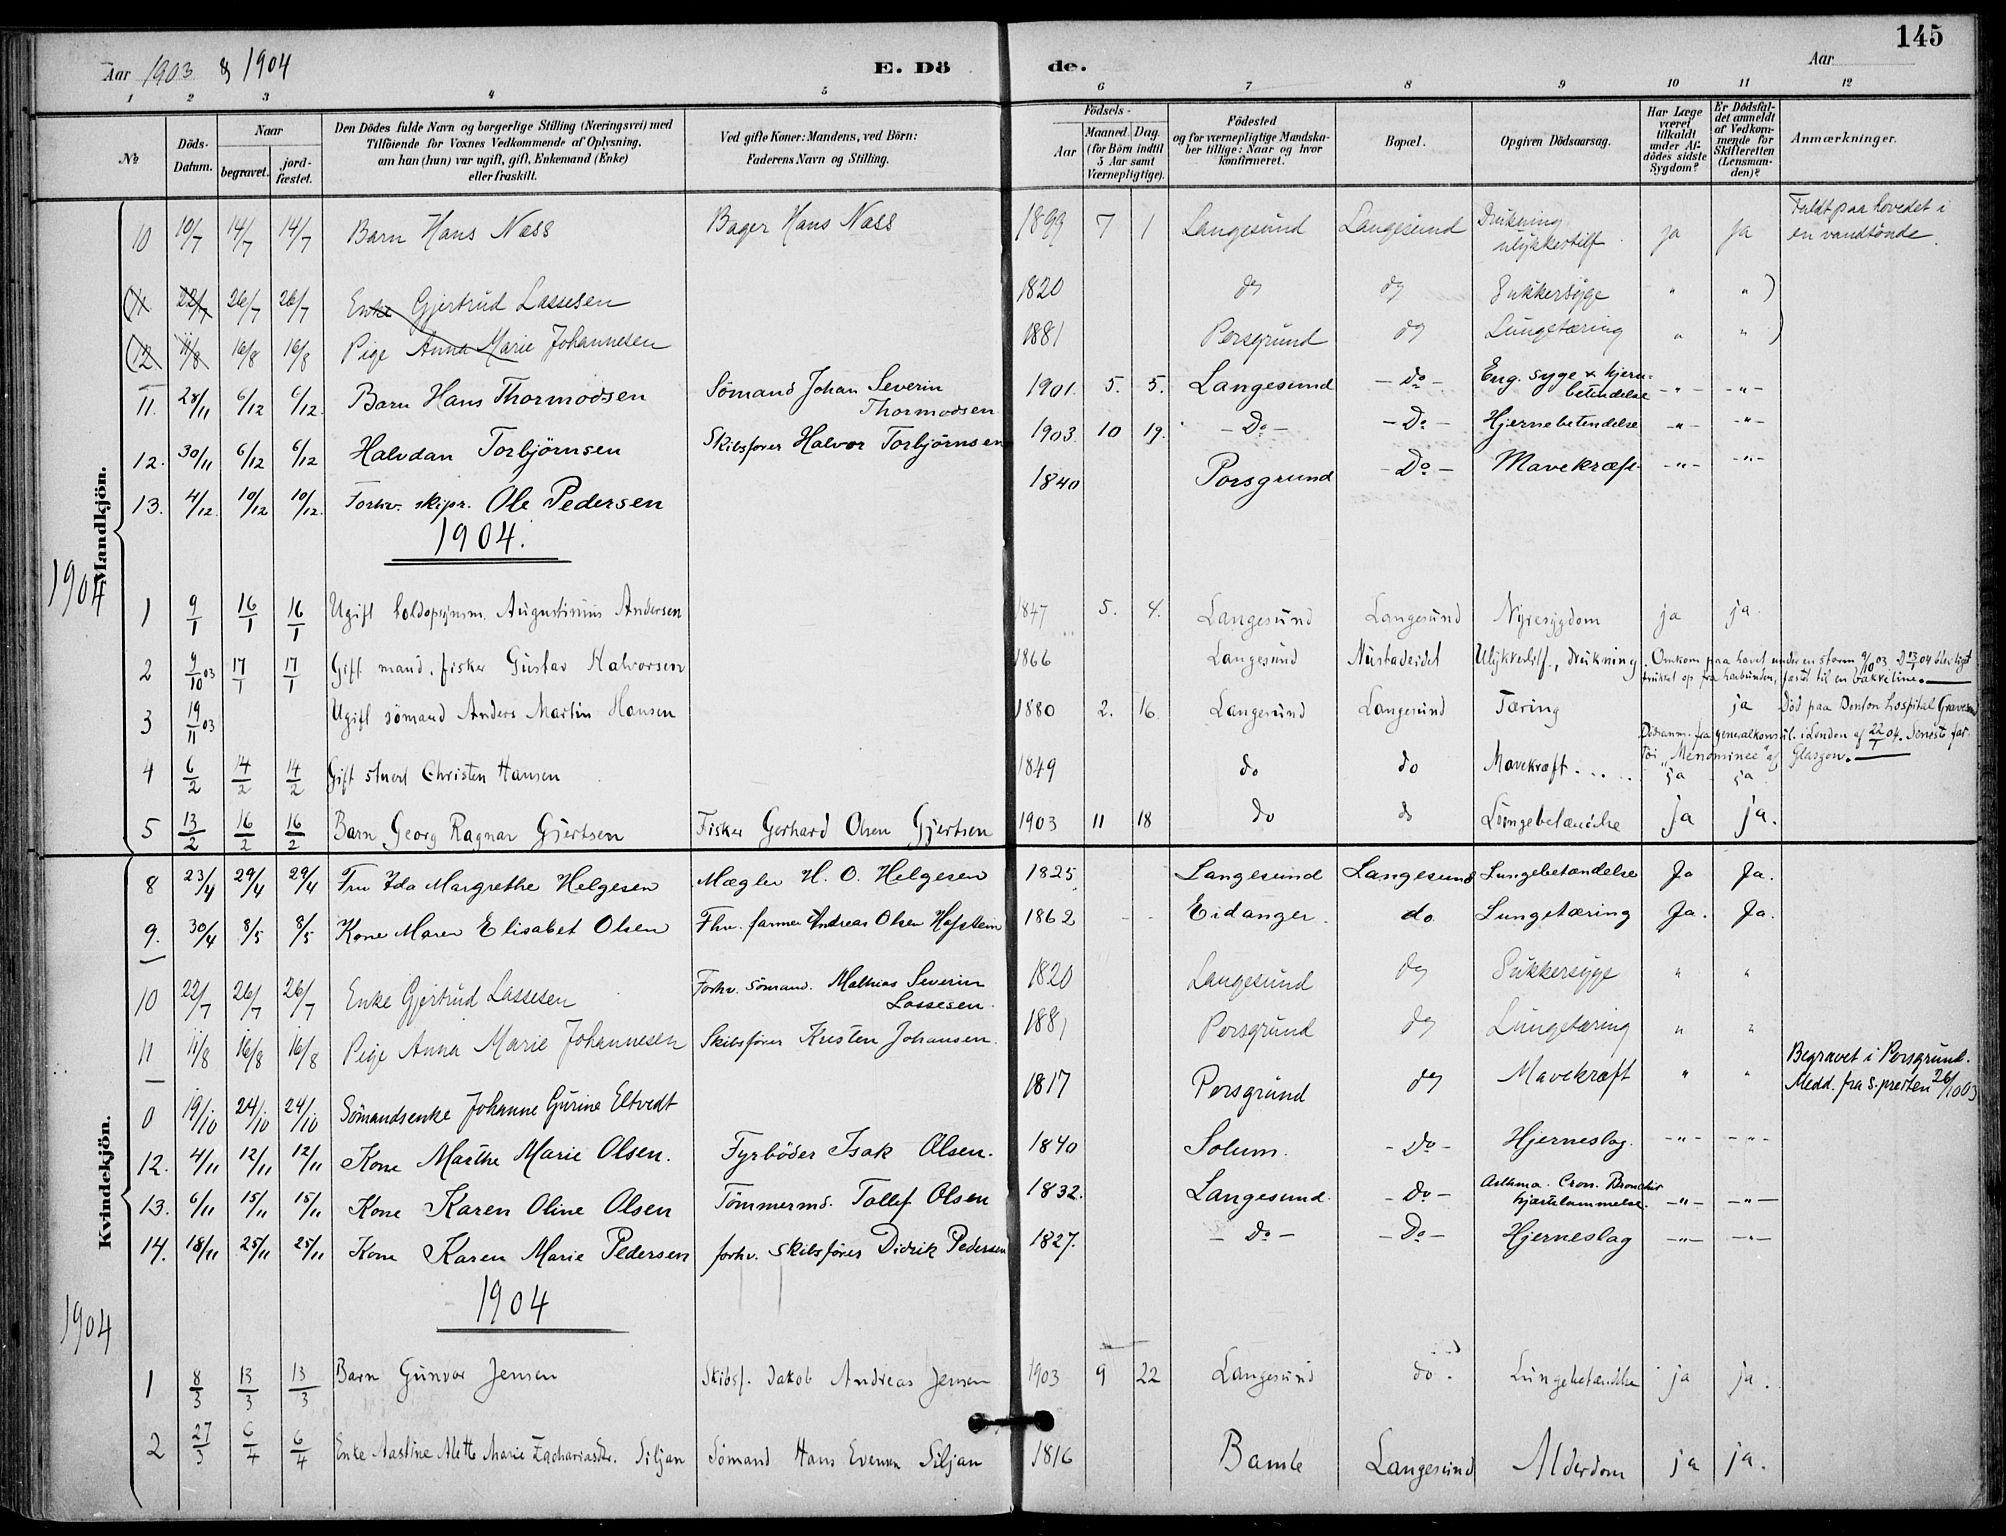 SAKO, Langesund kirkebøker, F/Fa/L0003: Ministerialbok nr. 3, 1893-1907, s. 145